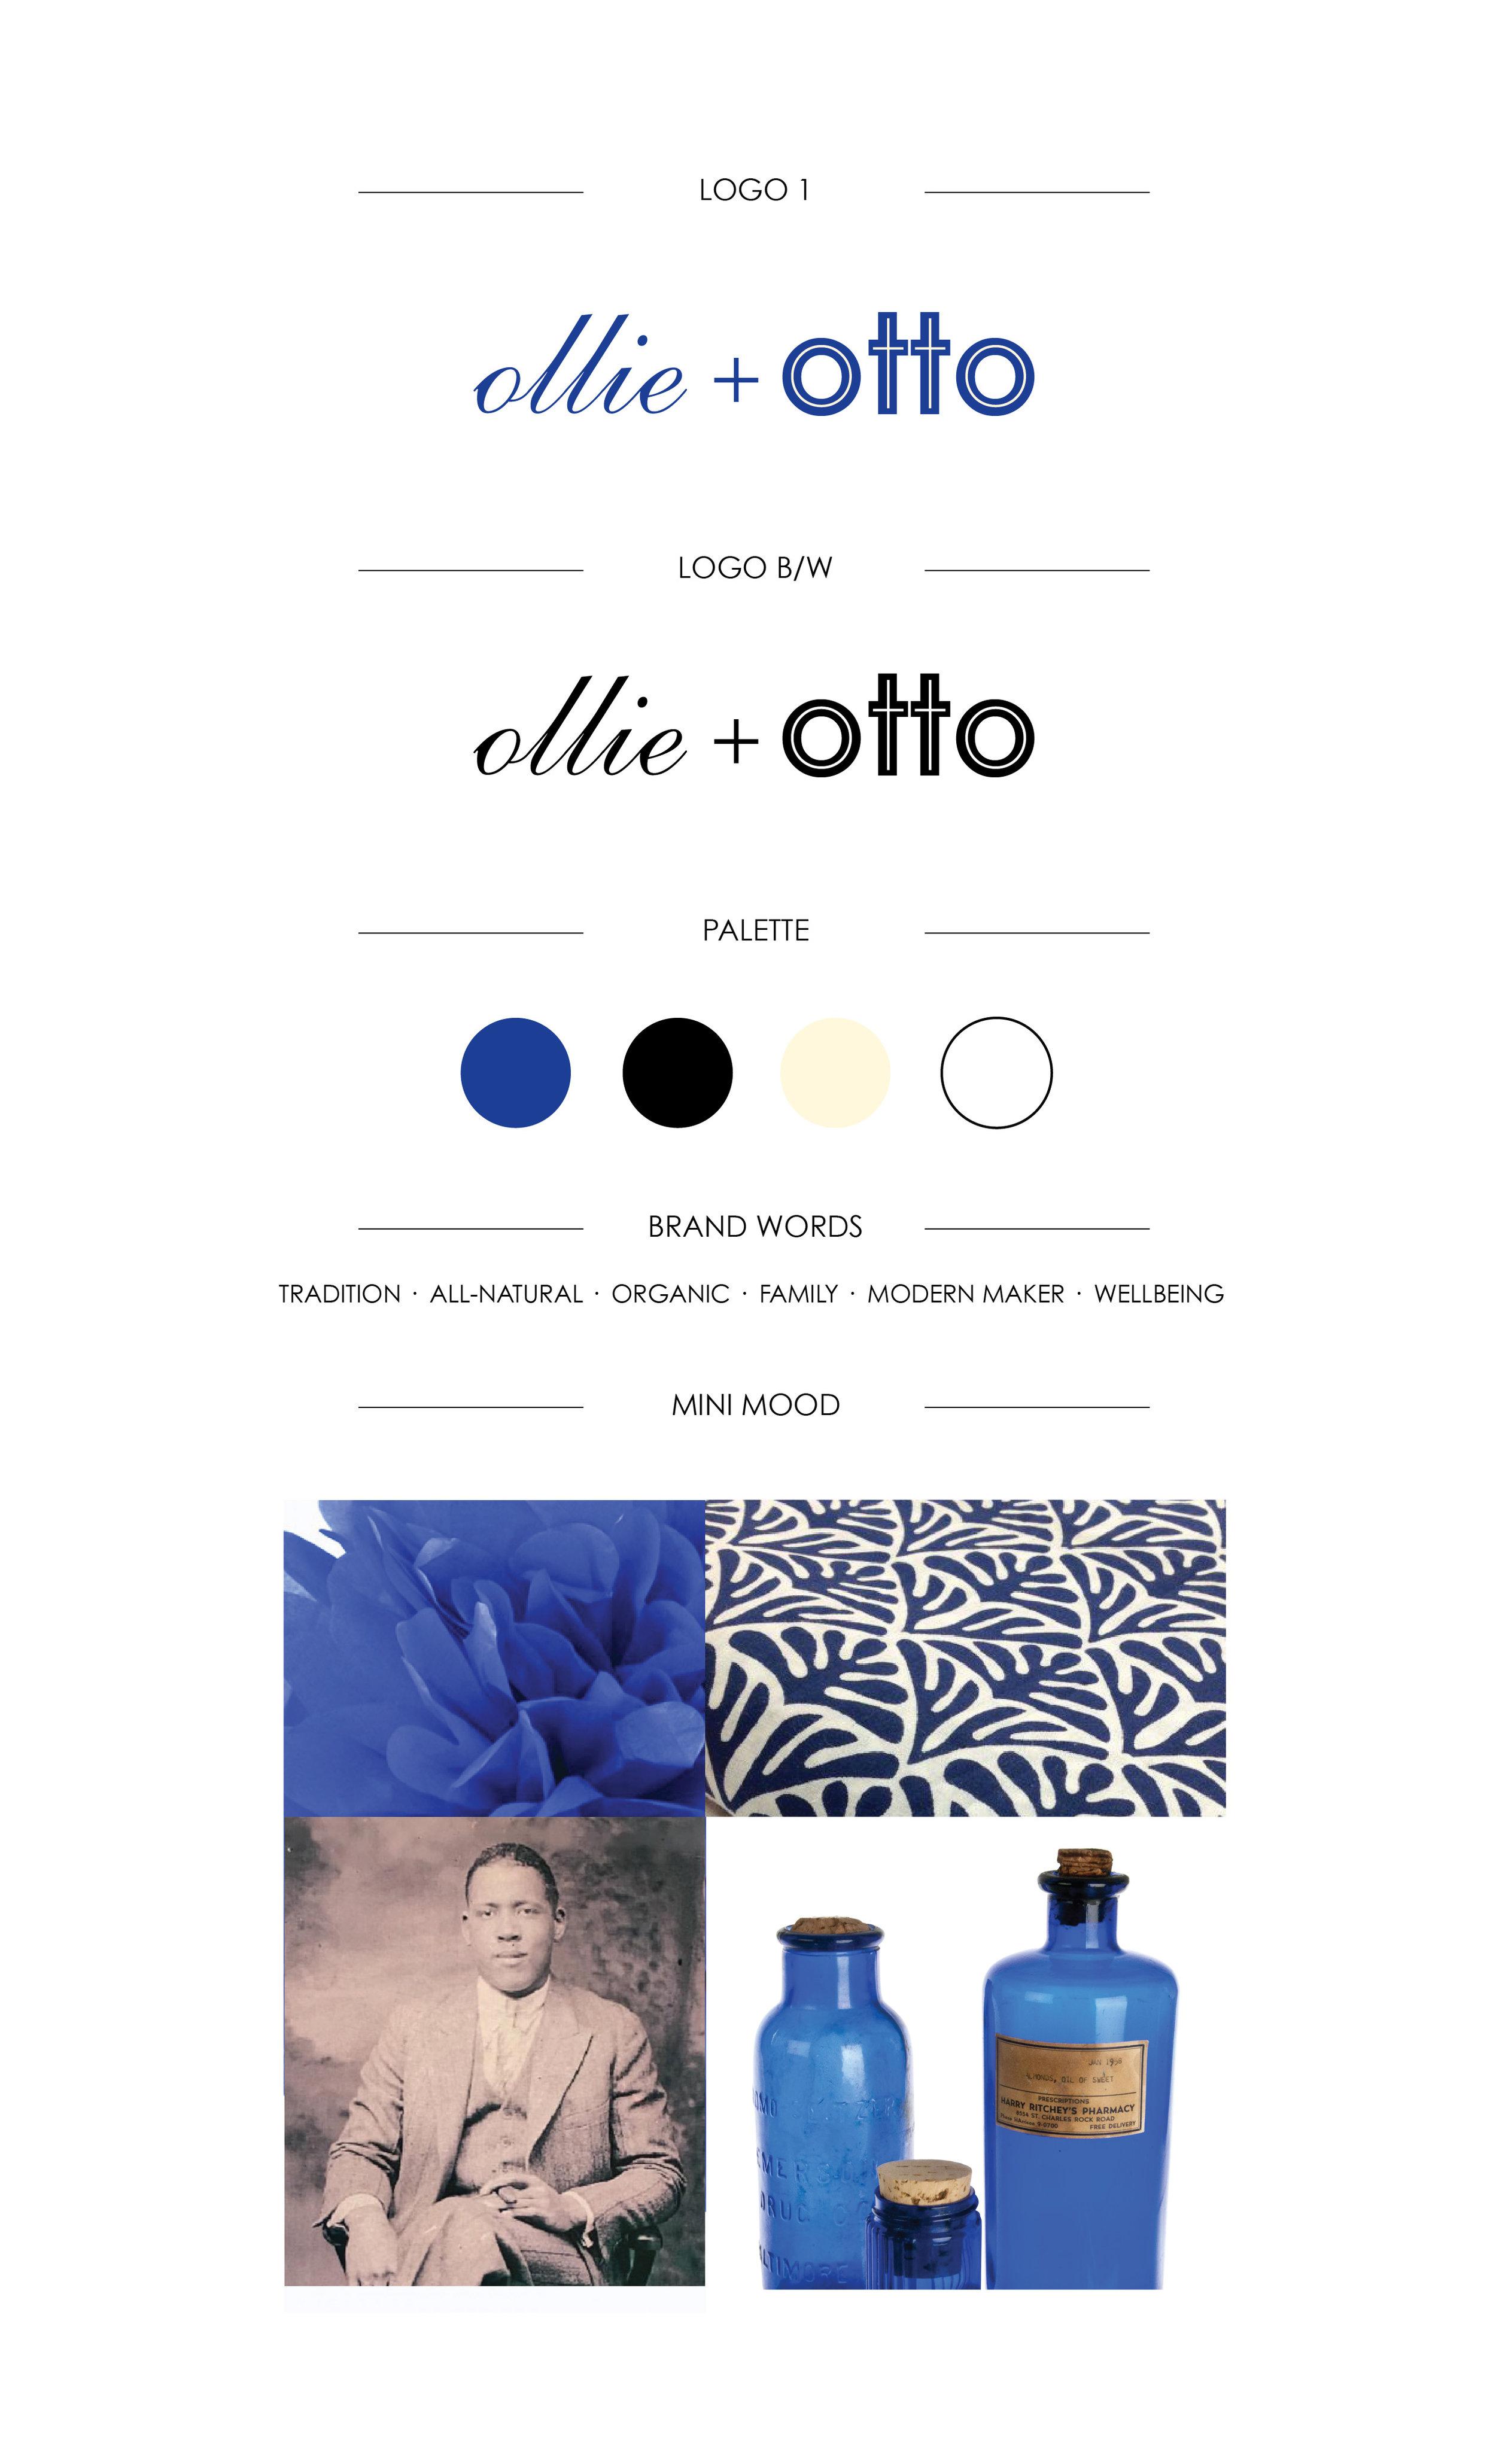 ollieandotto_logo-01.jpg